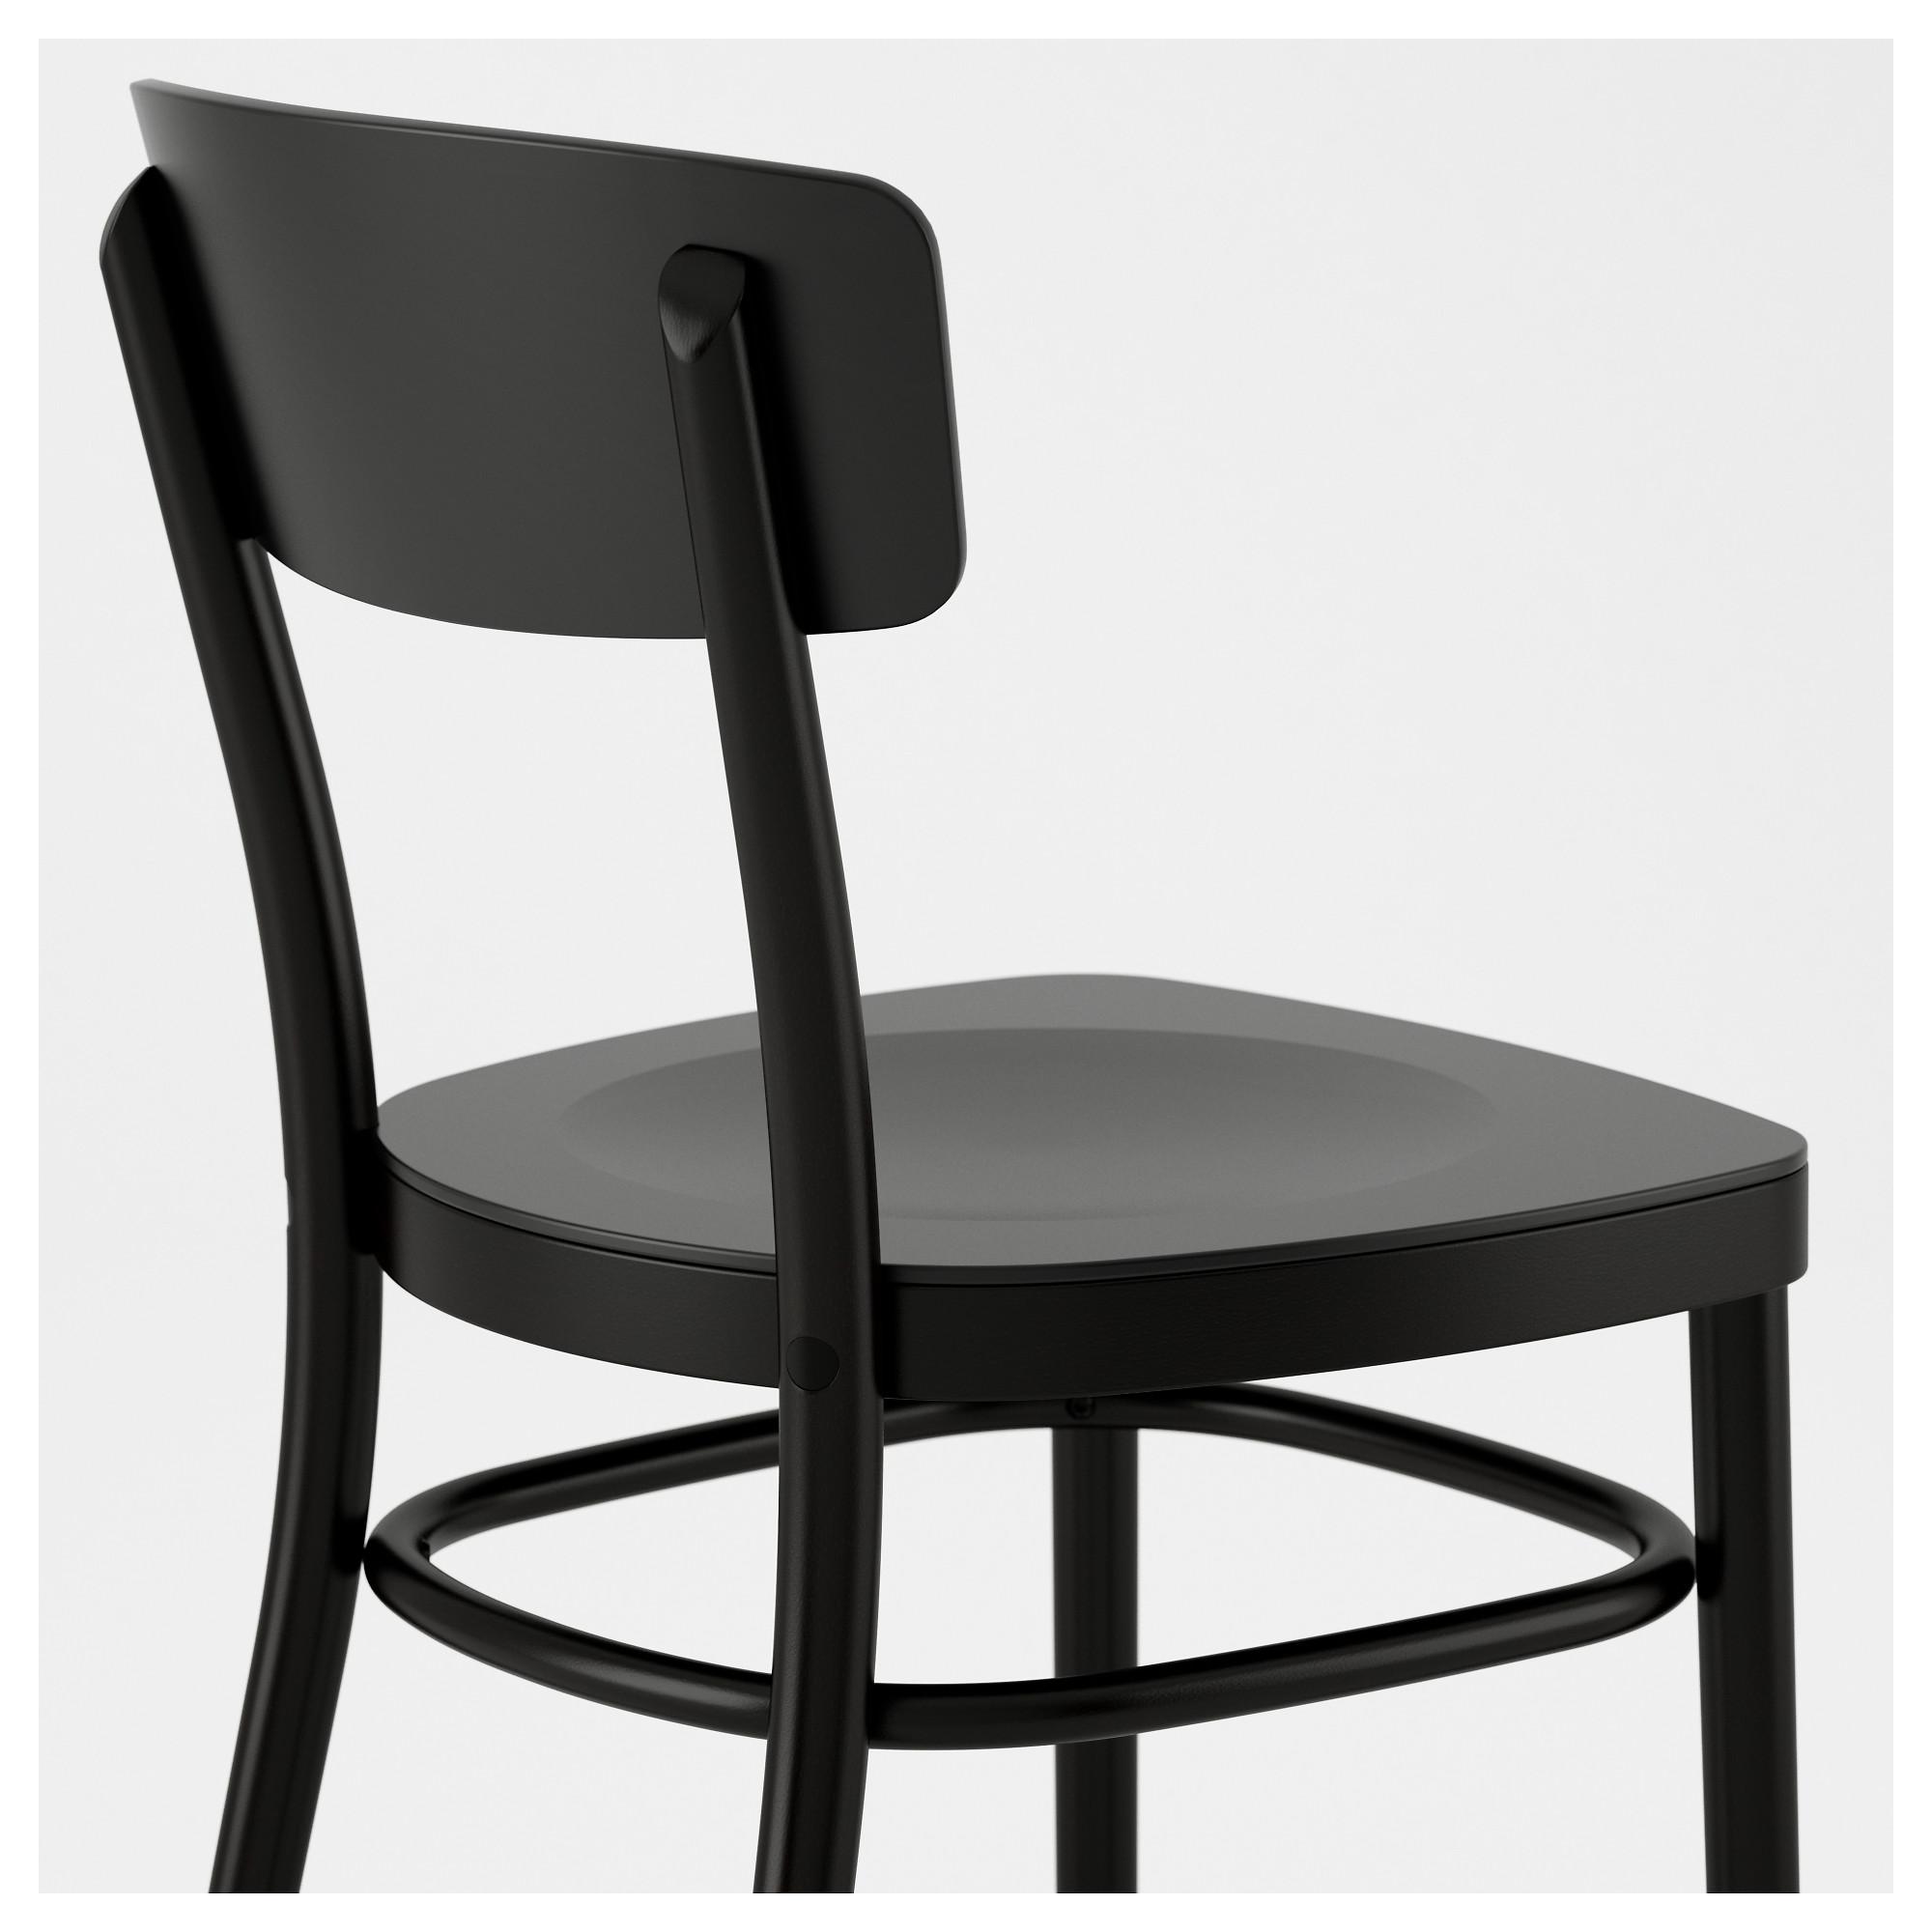 Astounding Idolf Chair Black Chair Ikea Chair Ikea Inzonedesignstudio Interior Chair Design Inzonedesignstudiocom